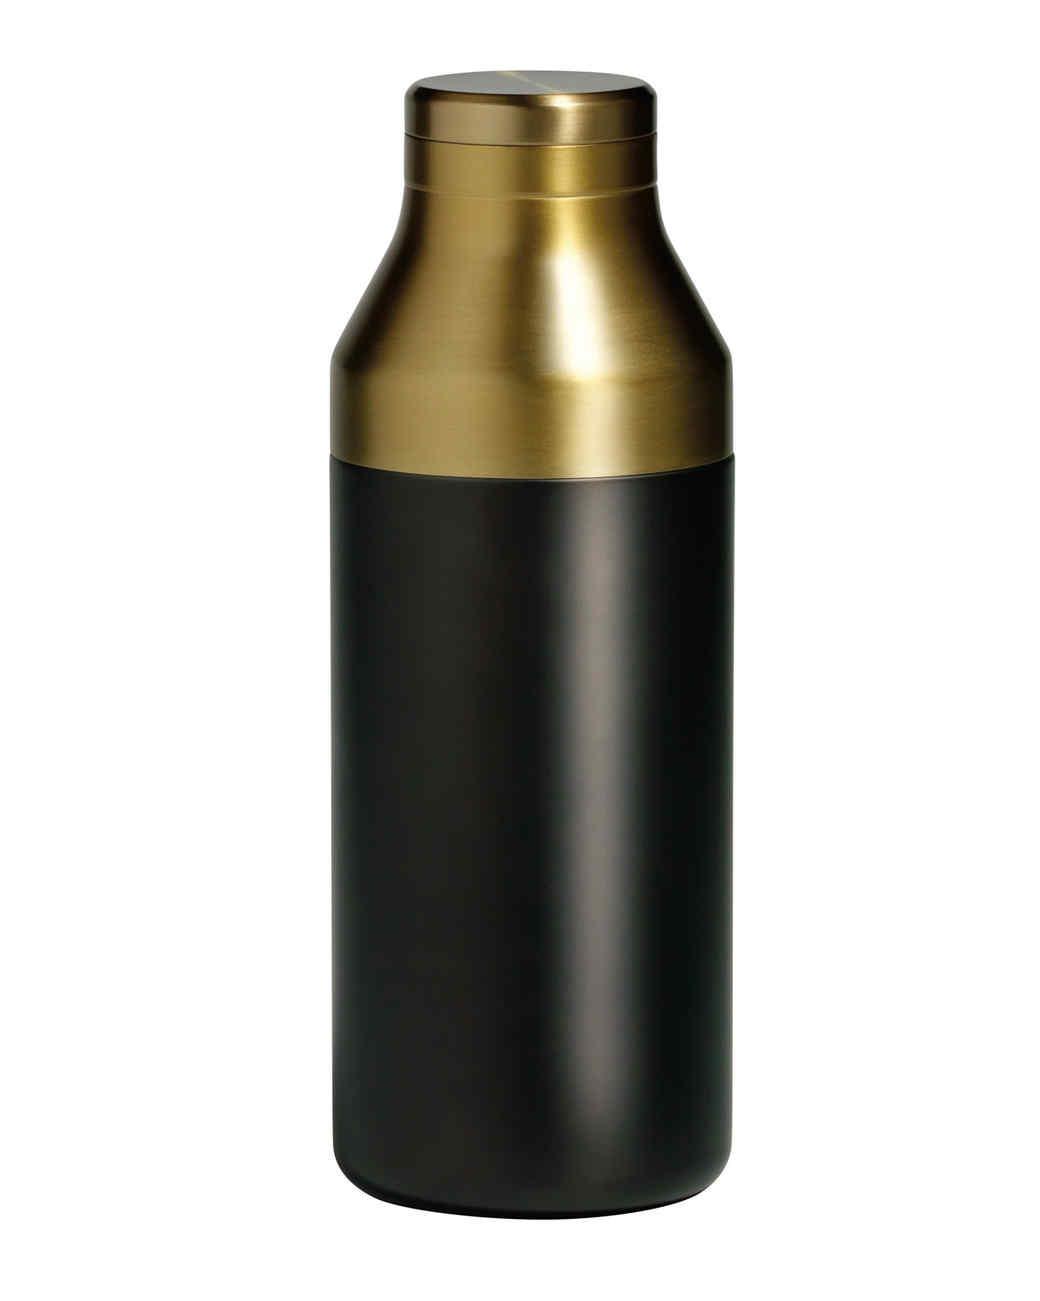 gold cocktail shaker gift